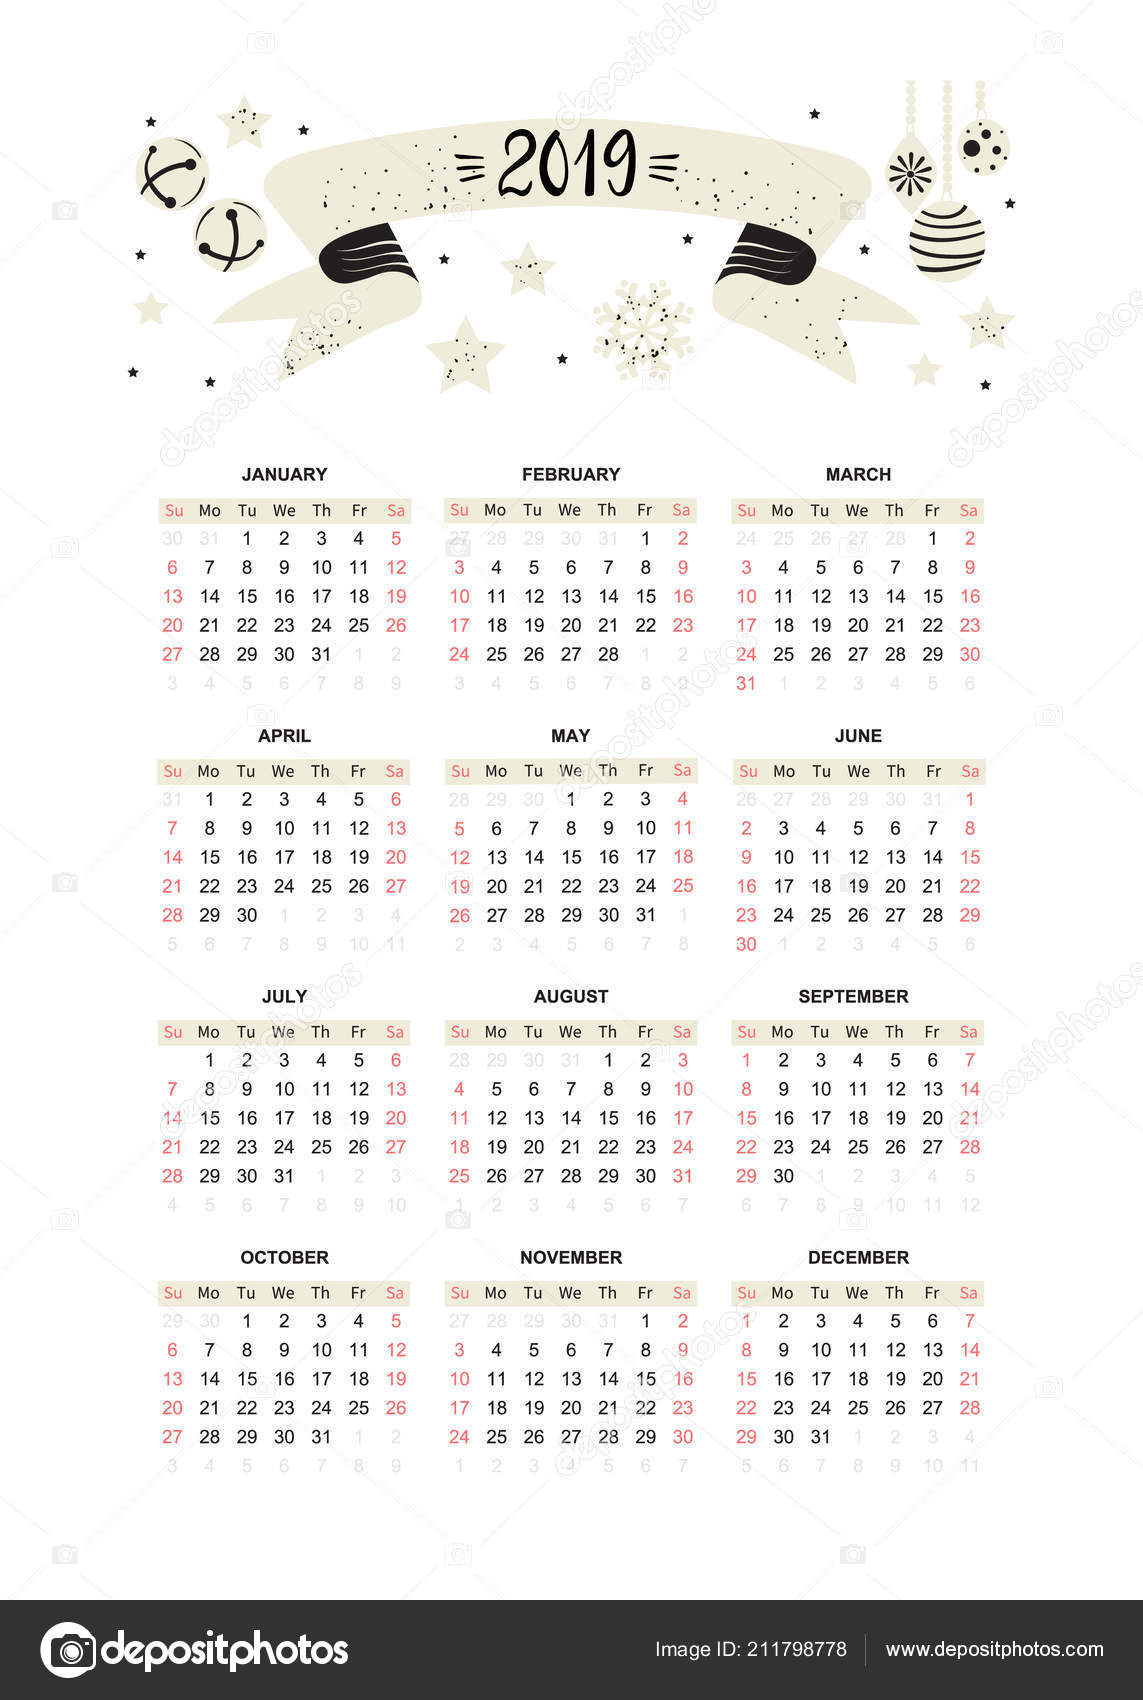 plantilla calendario 2019 decorado con mano escrita